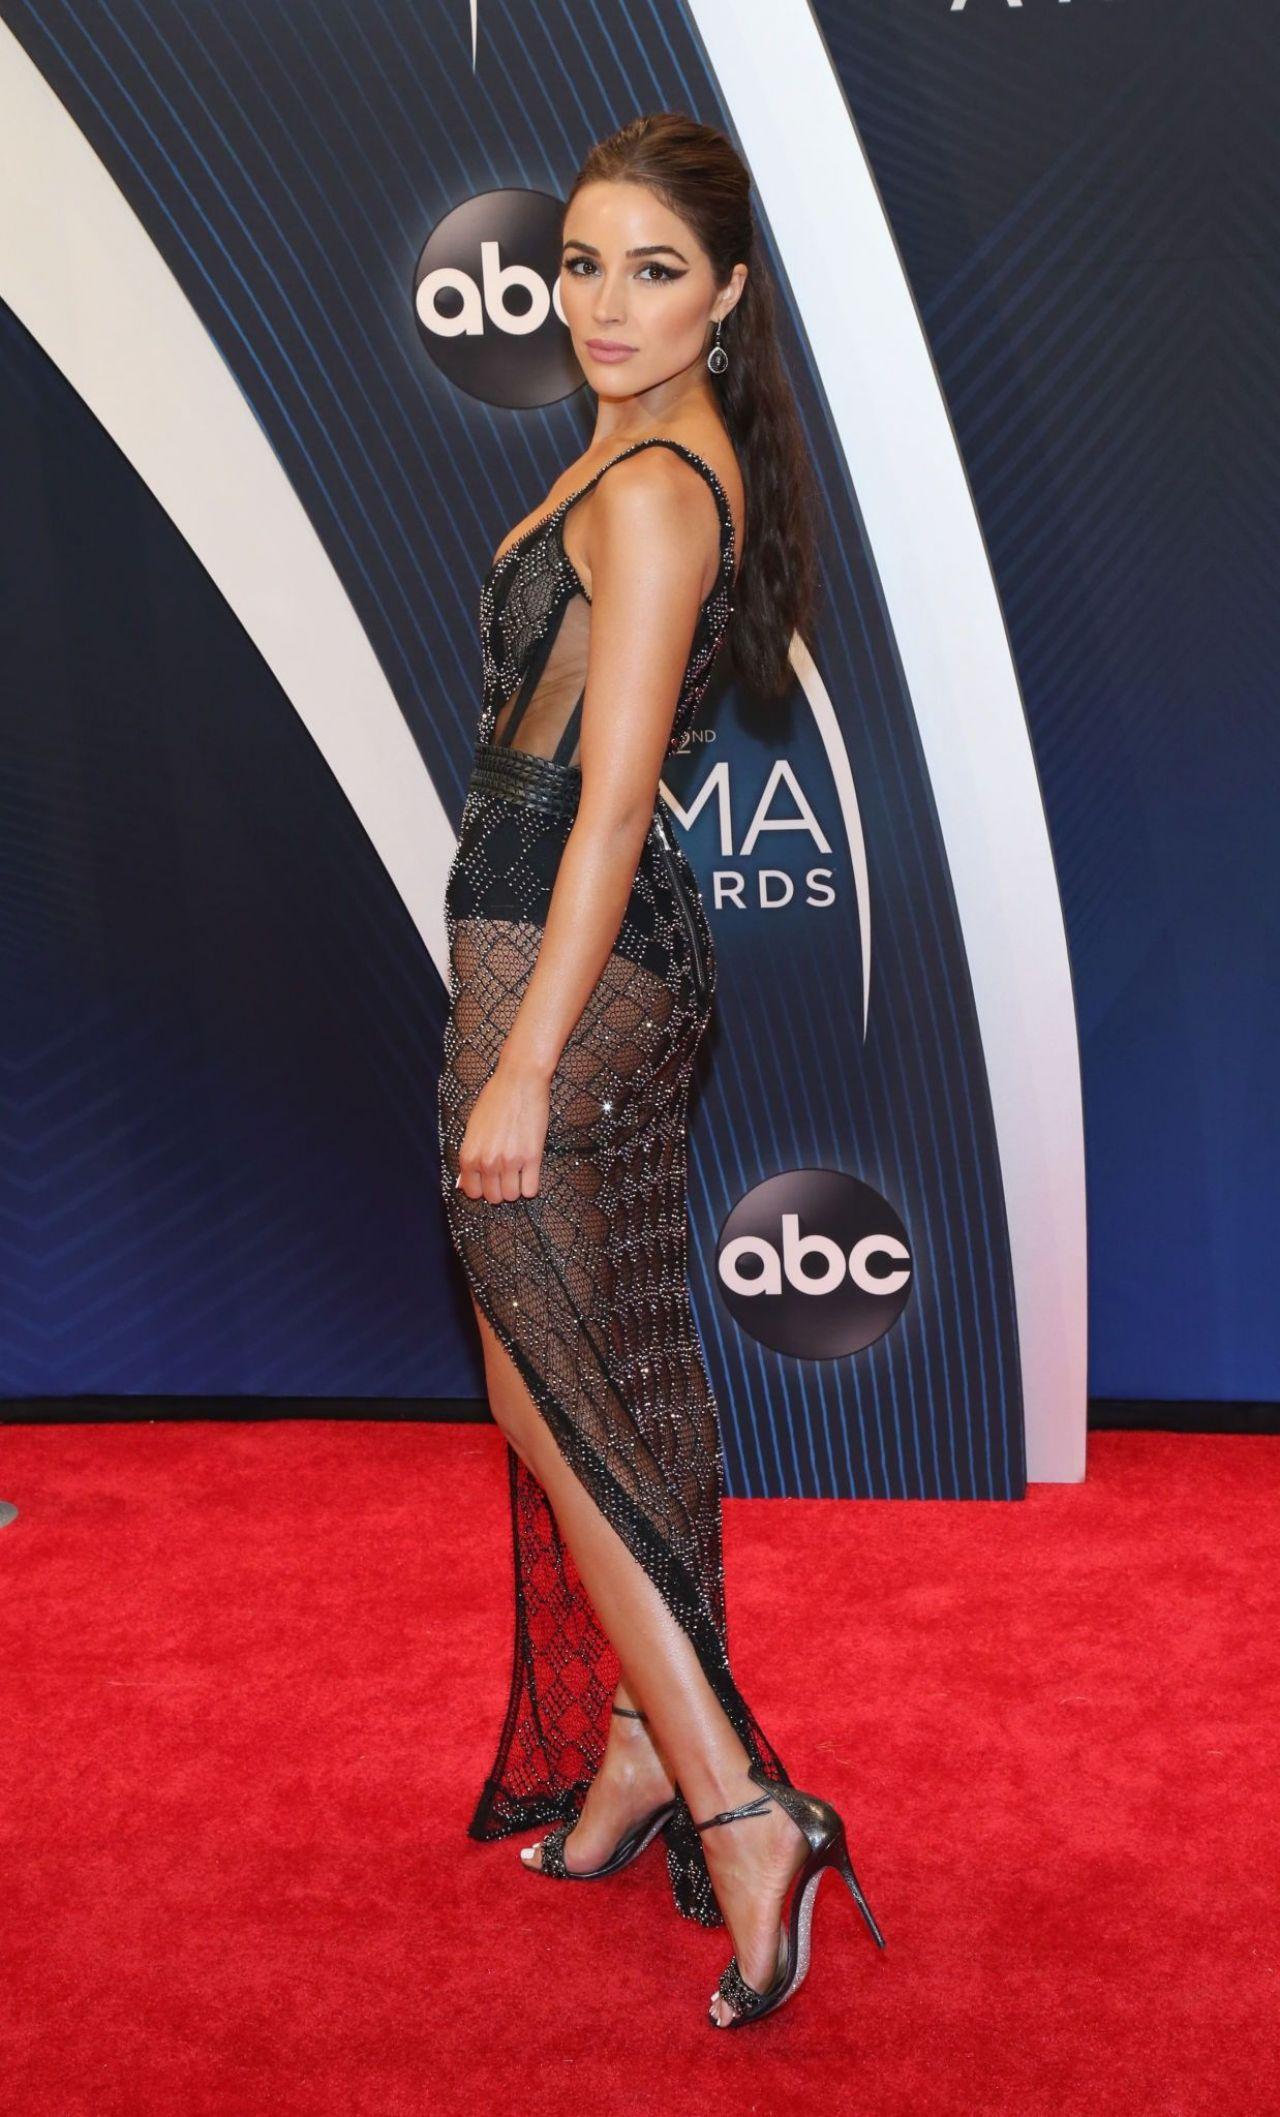 The celebrity dresses karlie kloss